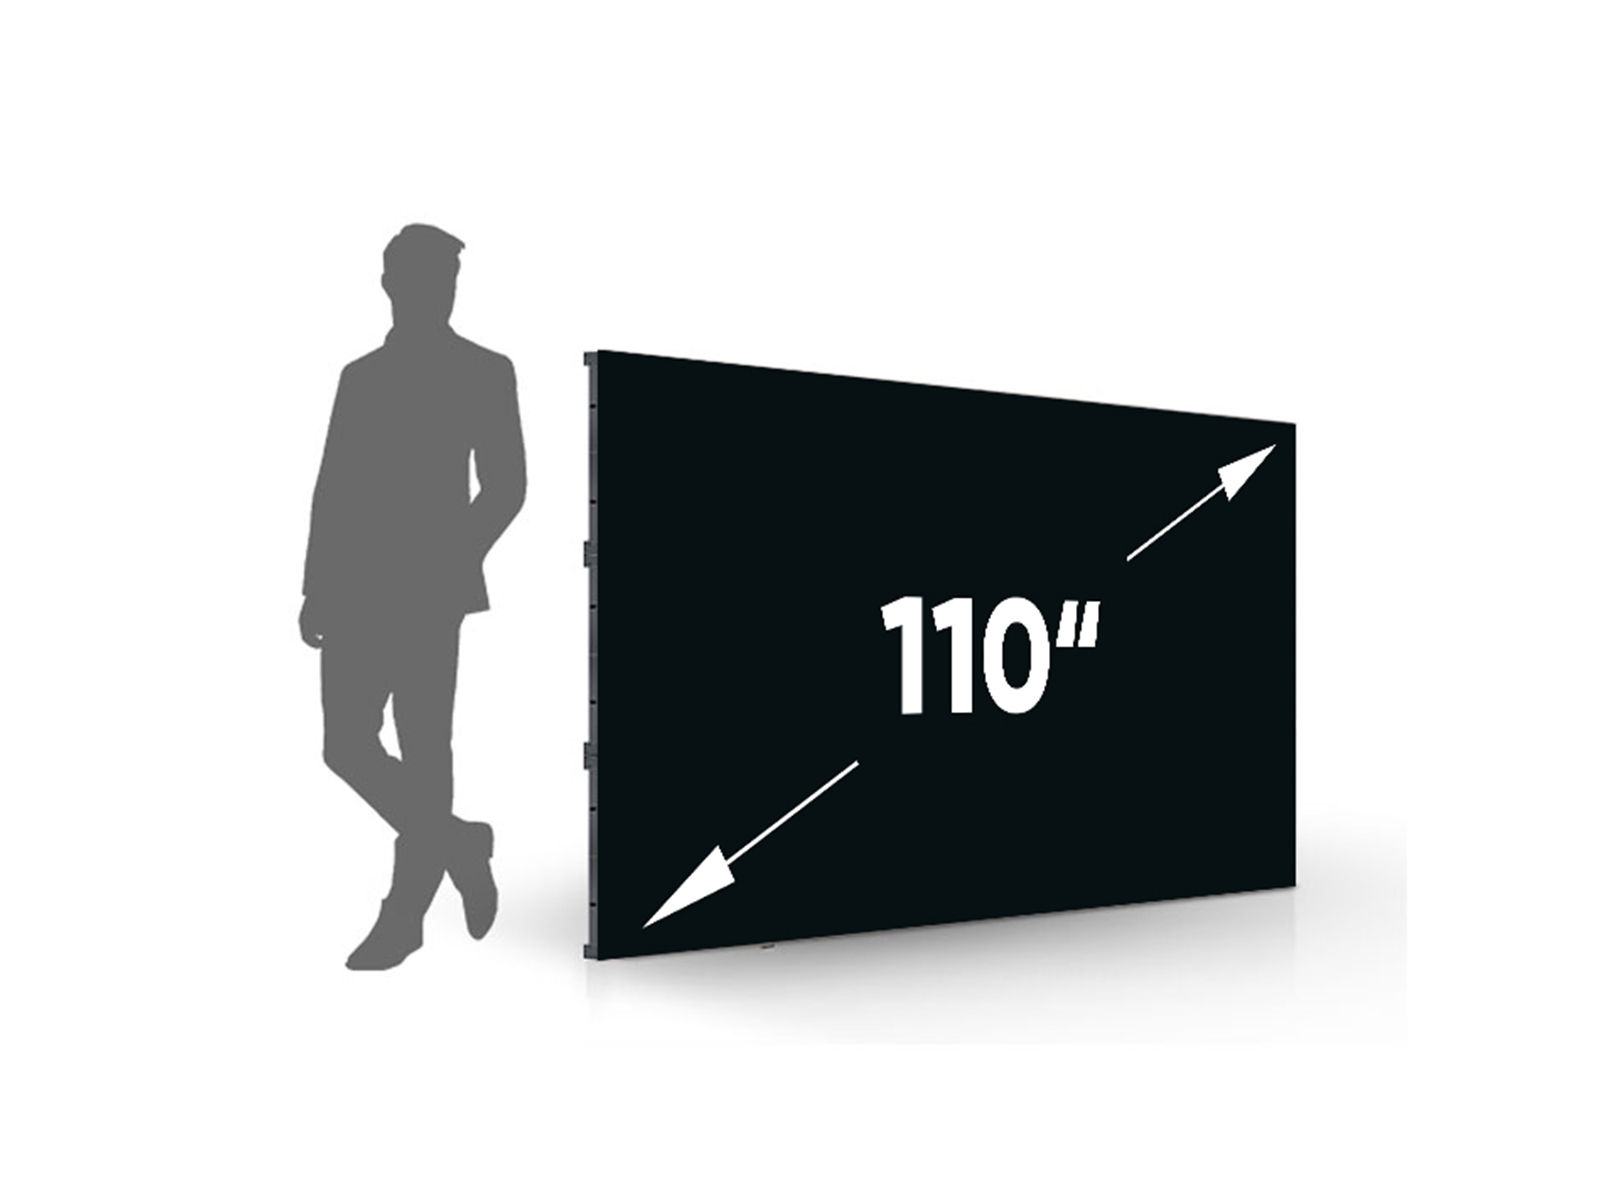 "Unilumin Upanel 1.2 S | LED FullHD Wand 110"" mit 1.2mm Pixelabstand"